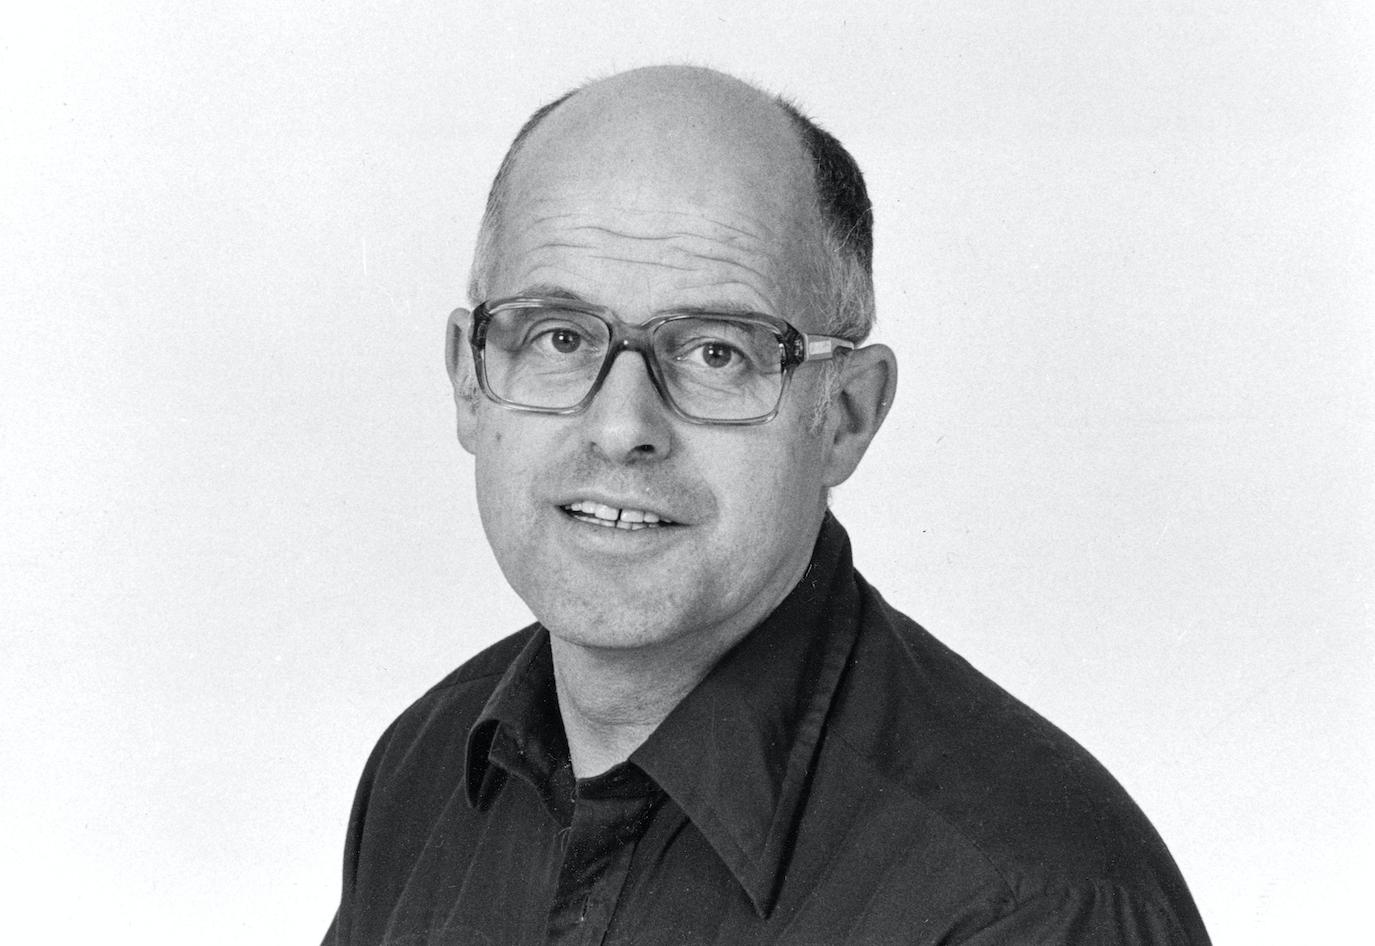 KG Björkman 1985.